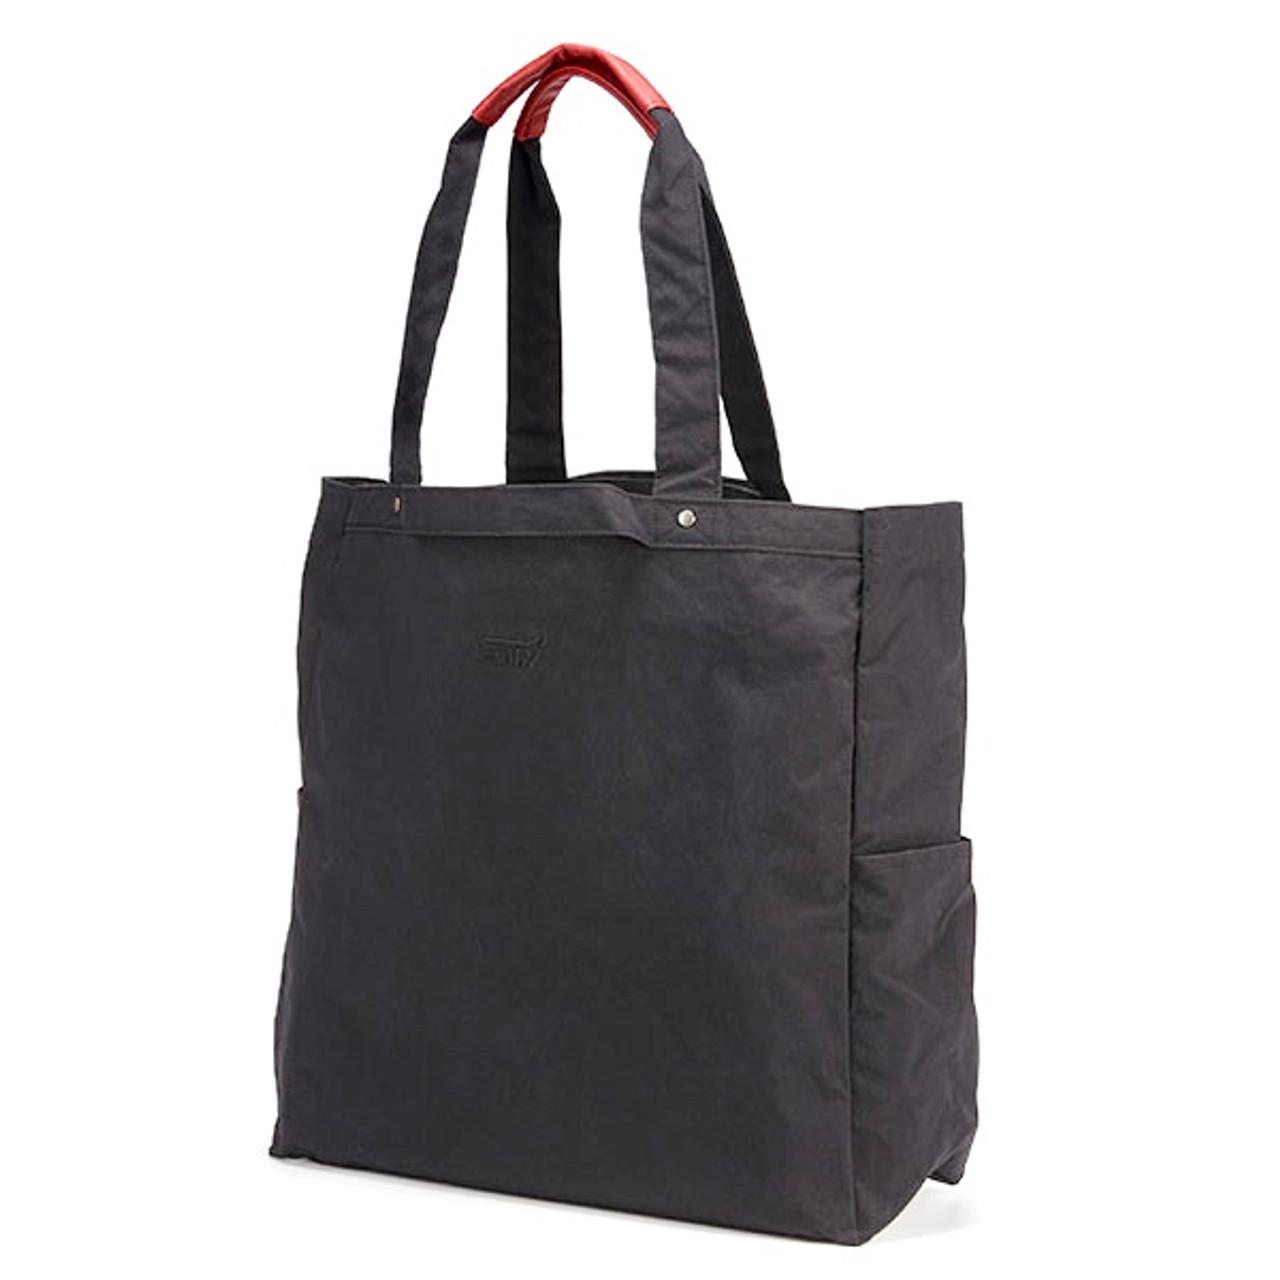 STSG18000700 STI Tote Bag Side at AVOJDM.com